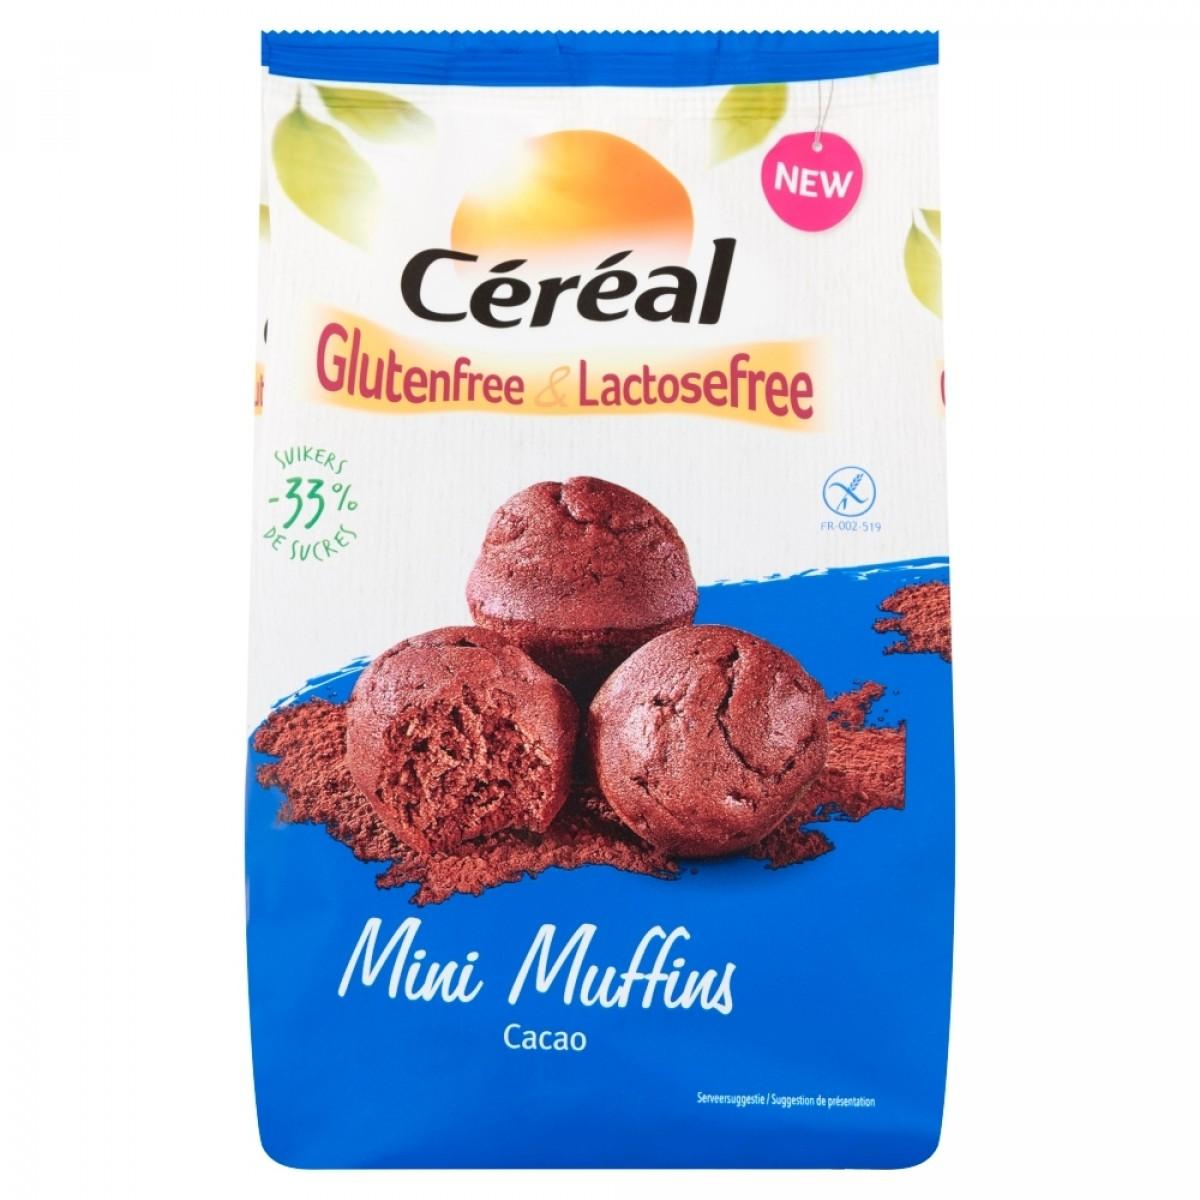 Mini Muffins Cacao